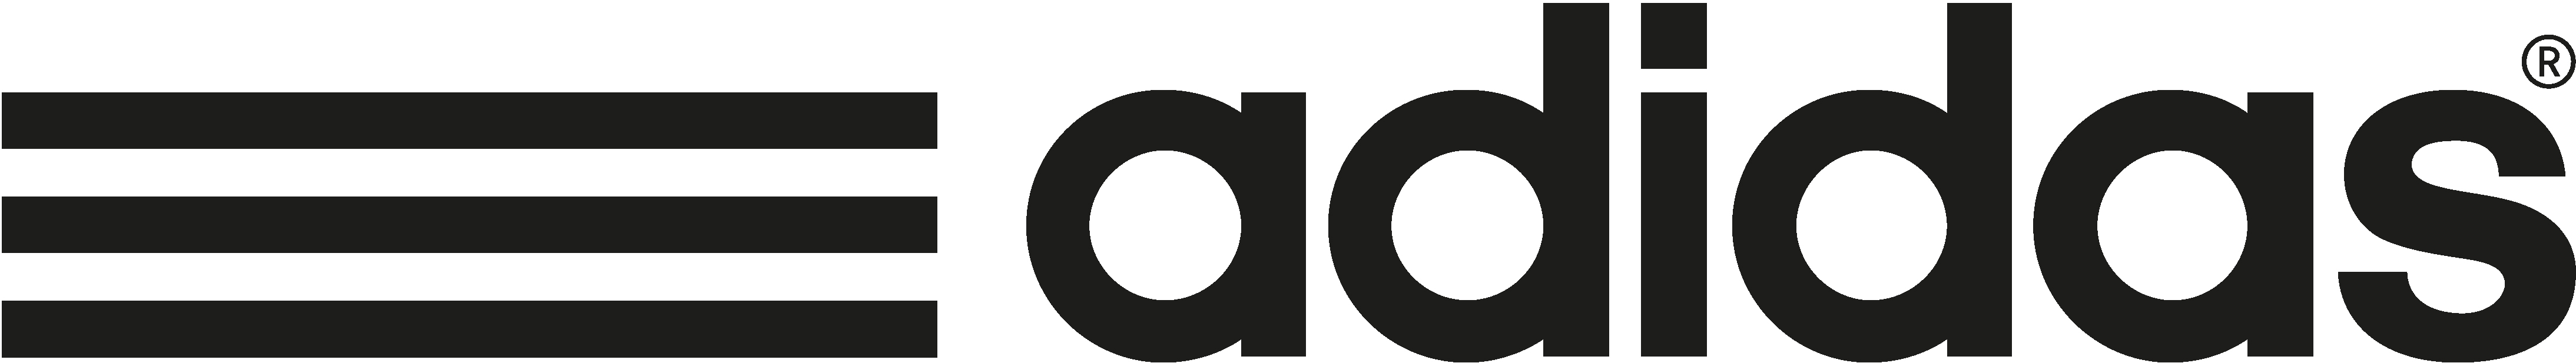 Adidas clipart logo design To preserve identity brand their